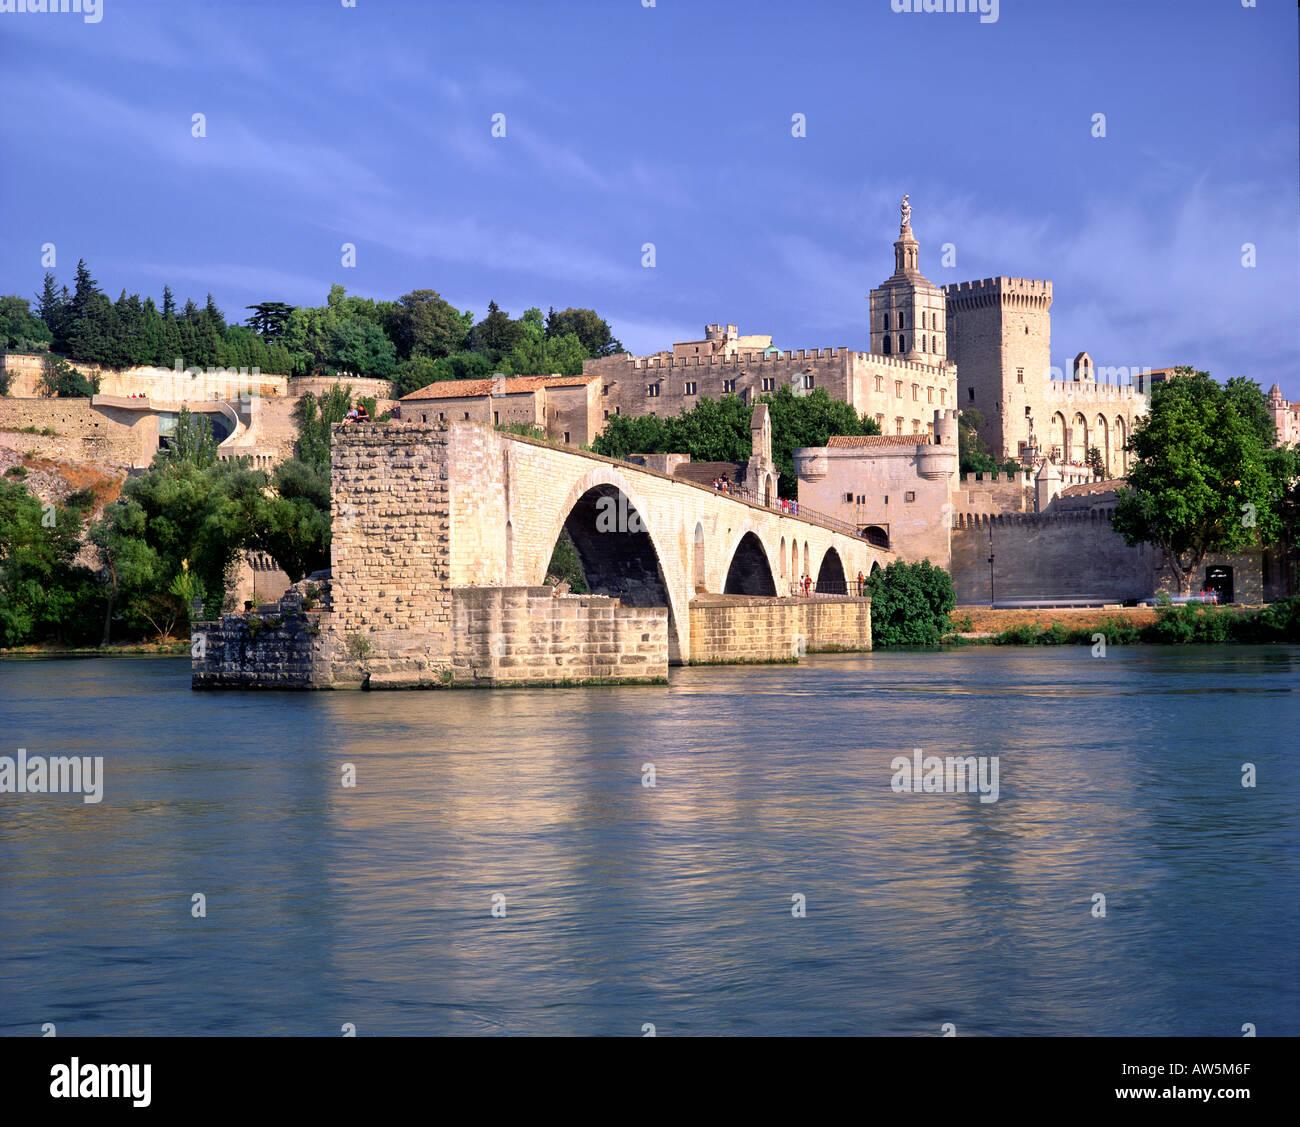 FR - PROVENCE:  Pont St. Benezet at Avignon - Stock Image